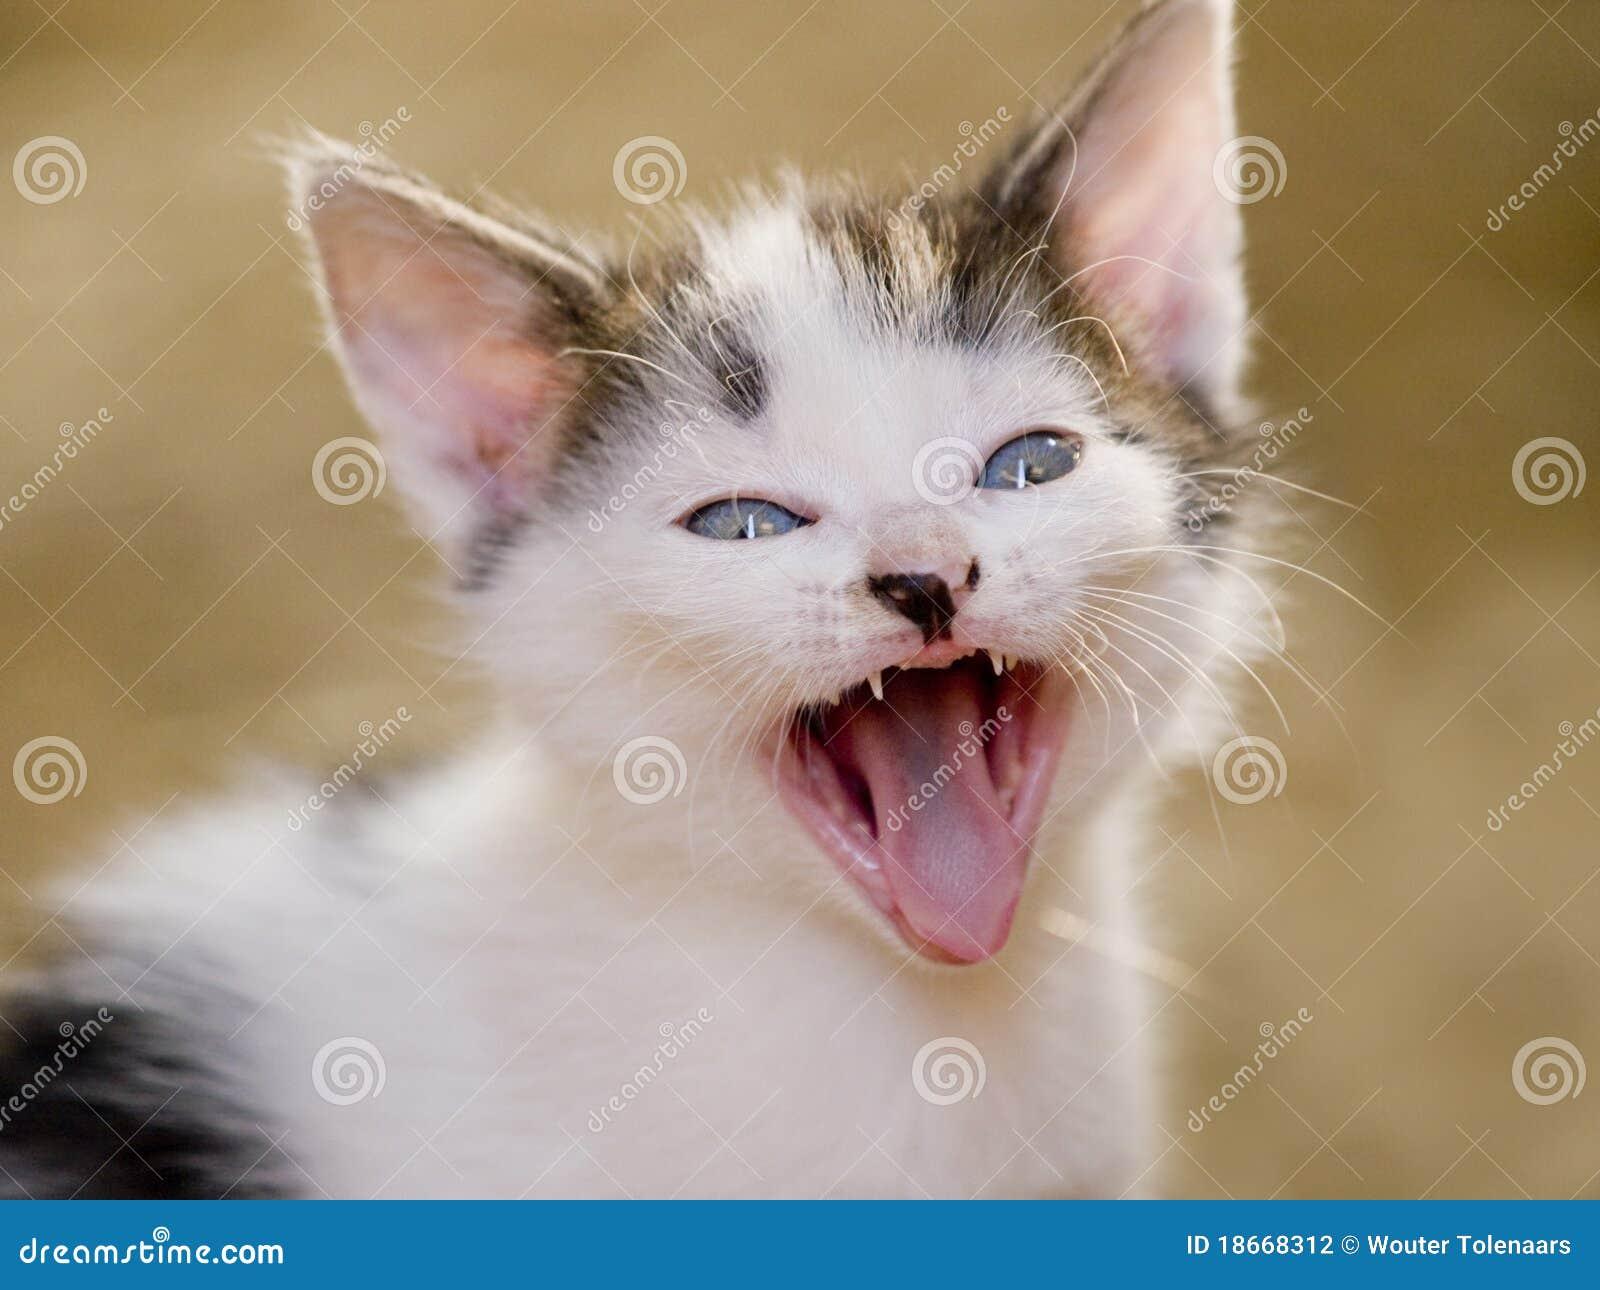 Cute Yawning Kitten Stock Photography - Image: 18668312